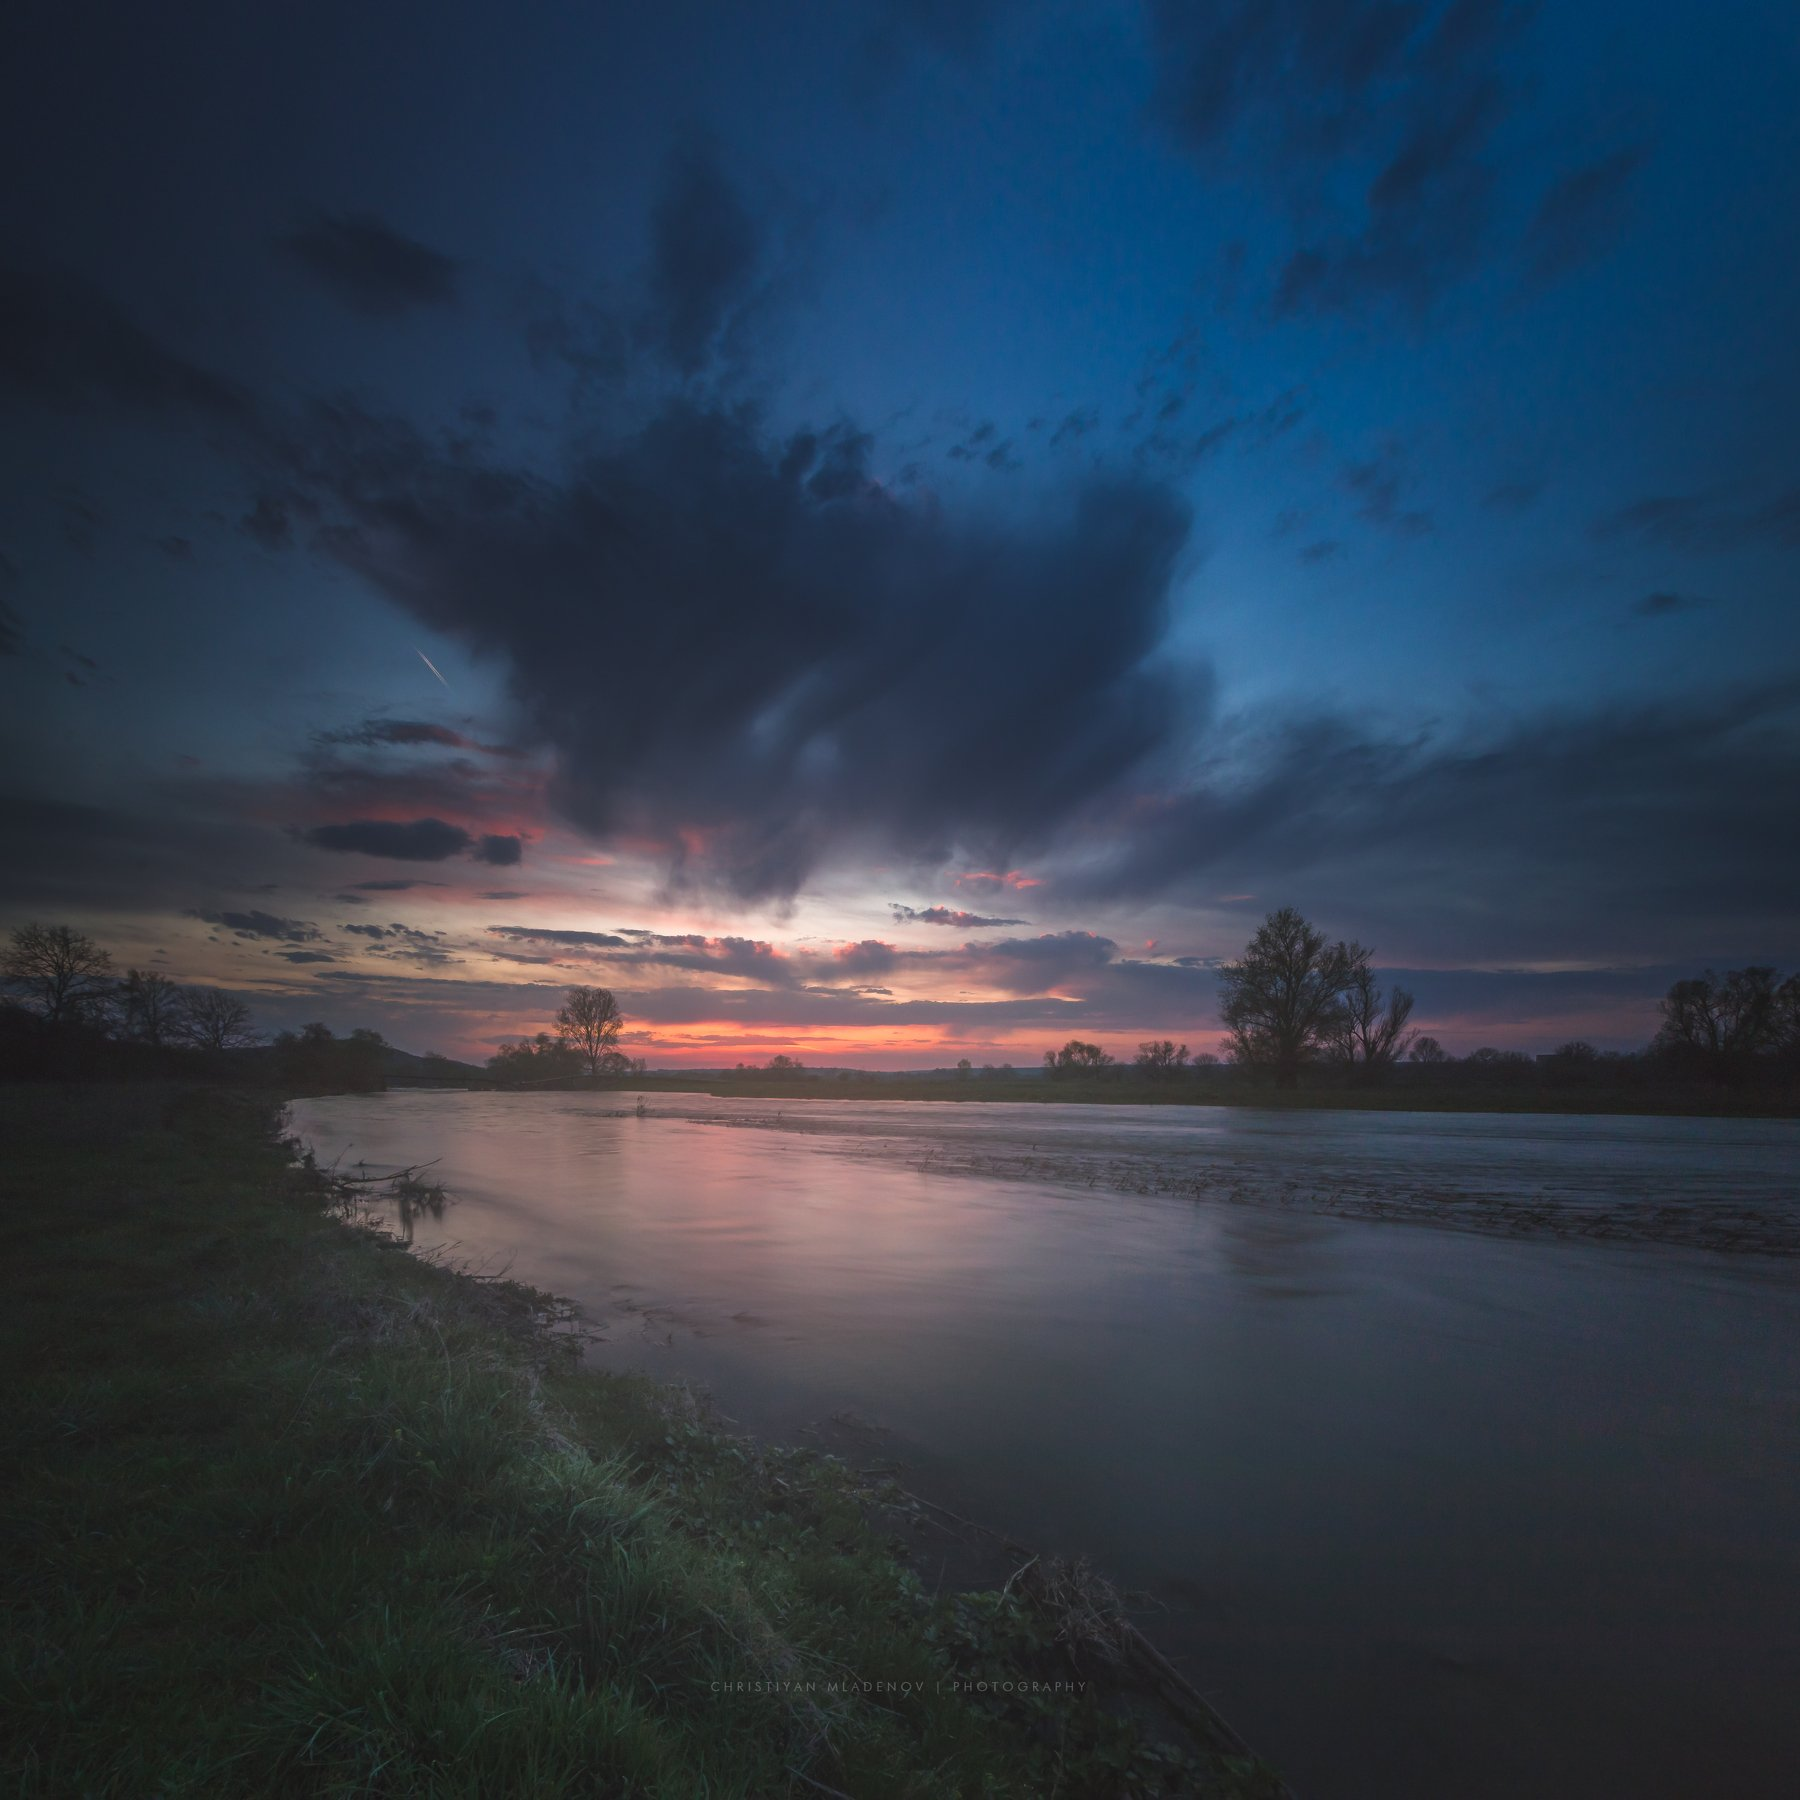 landscape, sunset, bulgaria, river, panorama, nature, long exposure, sun, evening, light, golden hour, warm, colorfull, dreamy, glow, sky, clouds, Кристиян Младенов